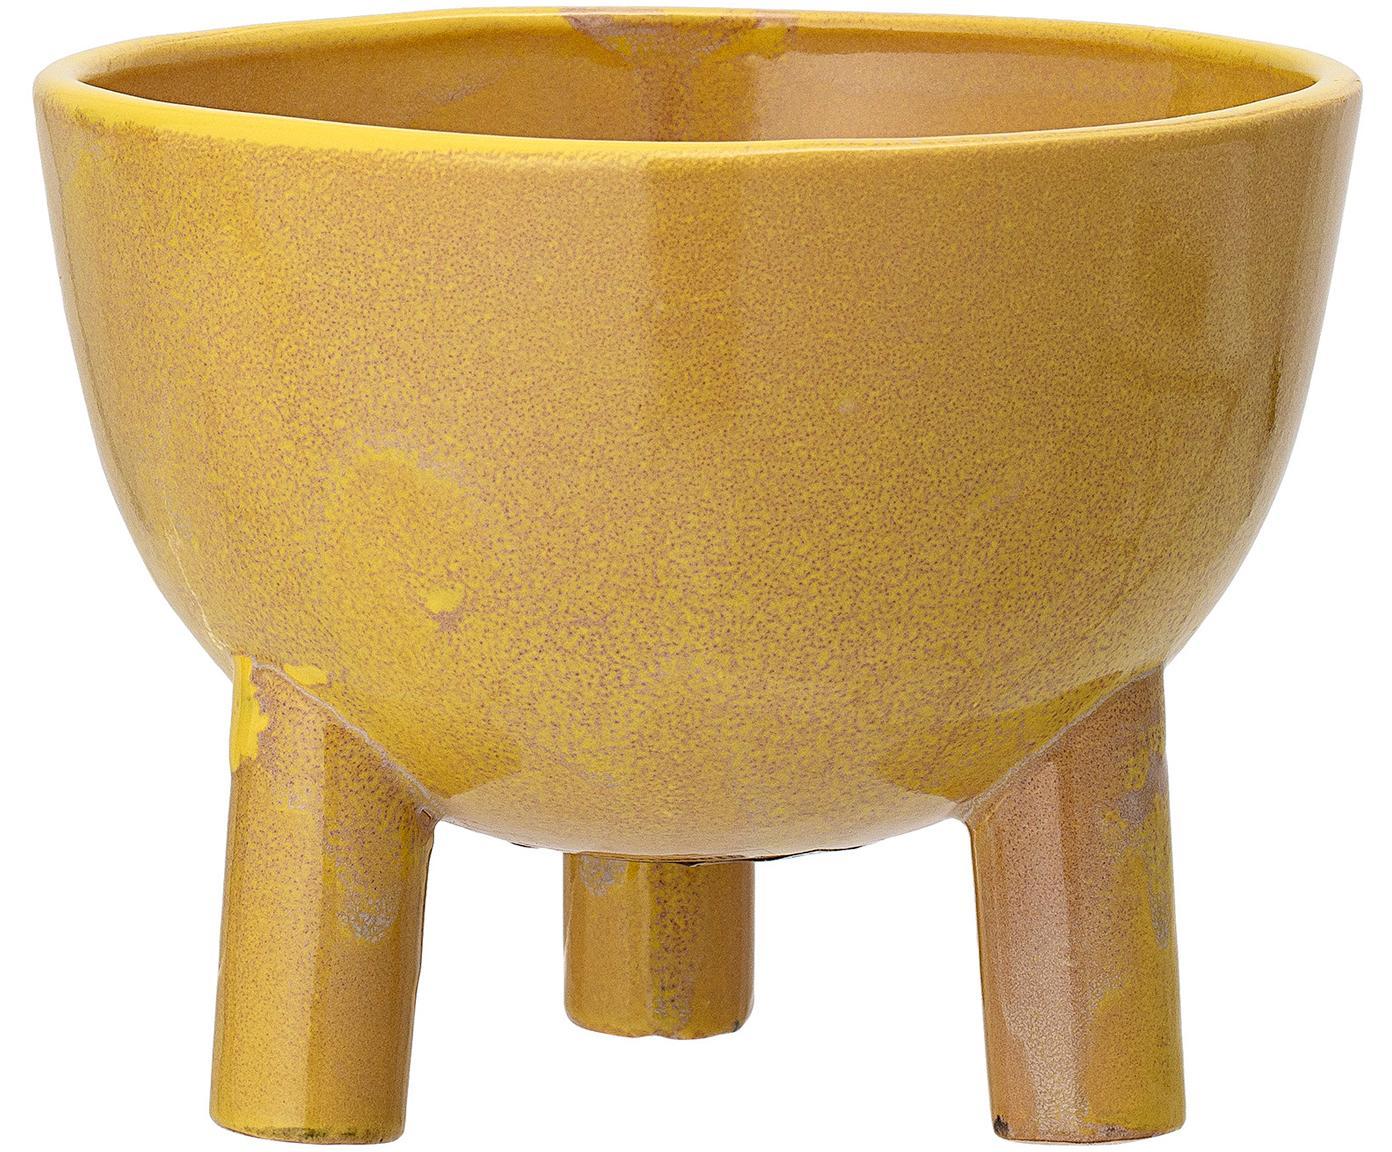 Portavaso in terracotta fatto a mano Aaren, Terracotta, Giallo, Ø 15 x Alt. 12 cm